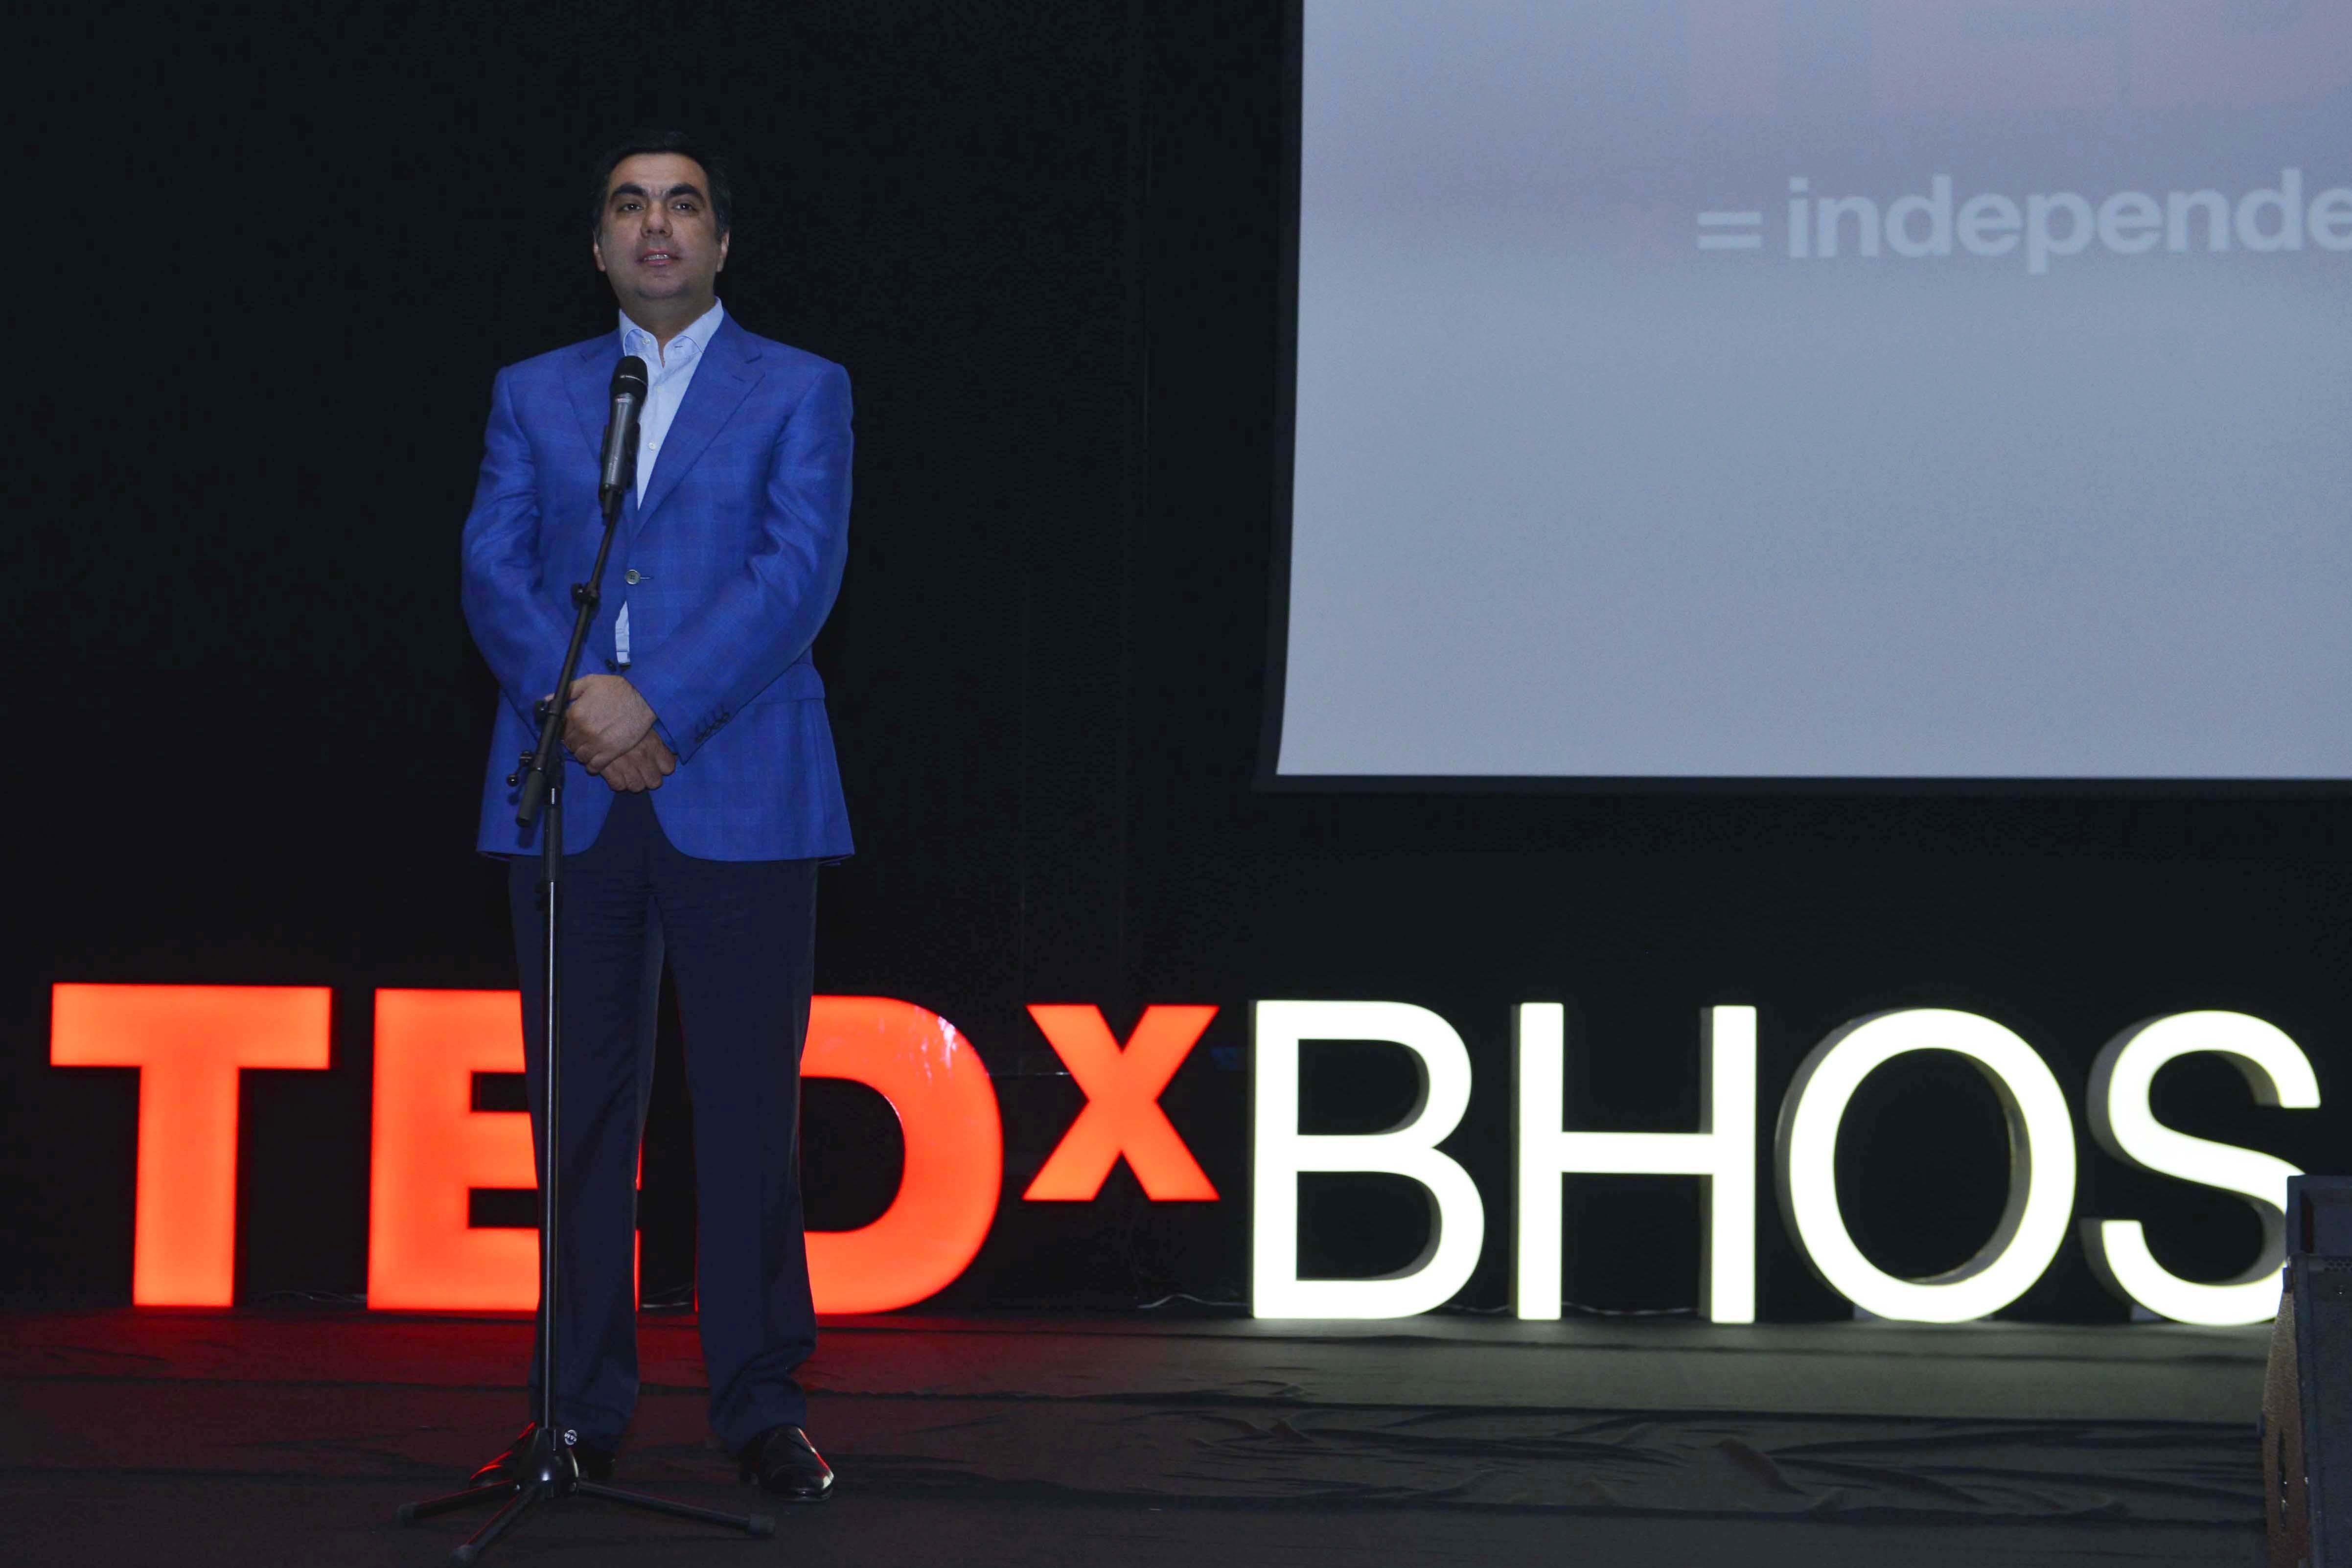 BANM-da ilin ilk TEDxBHOS konfransı keçirilib